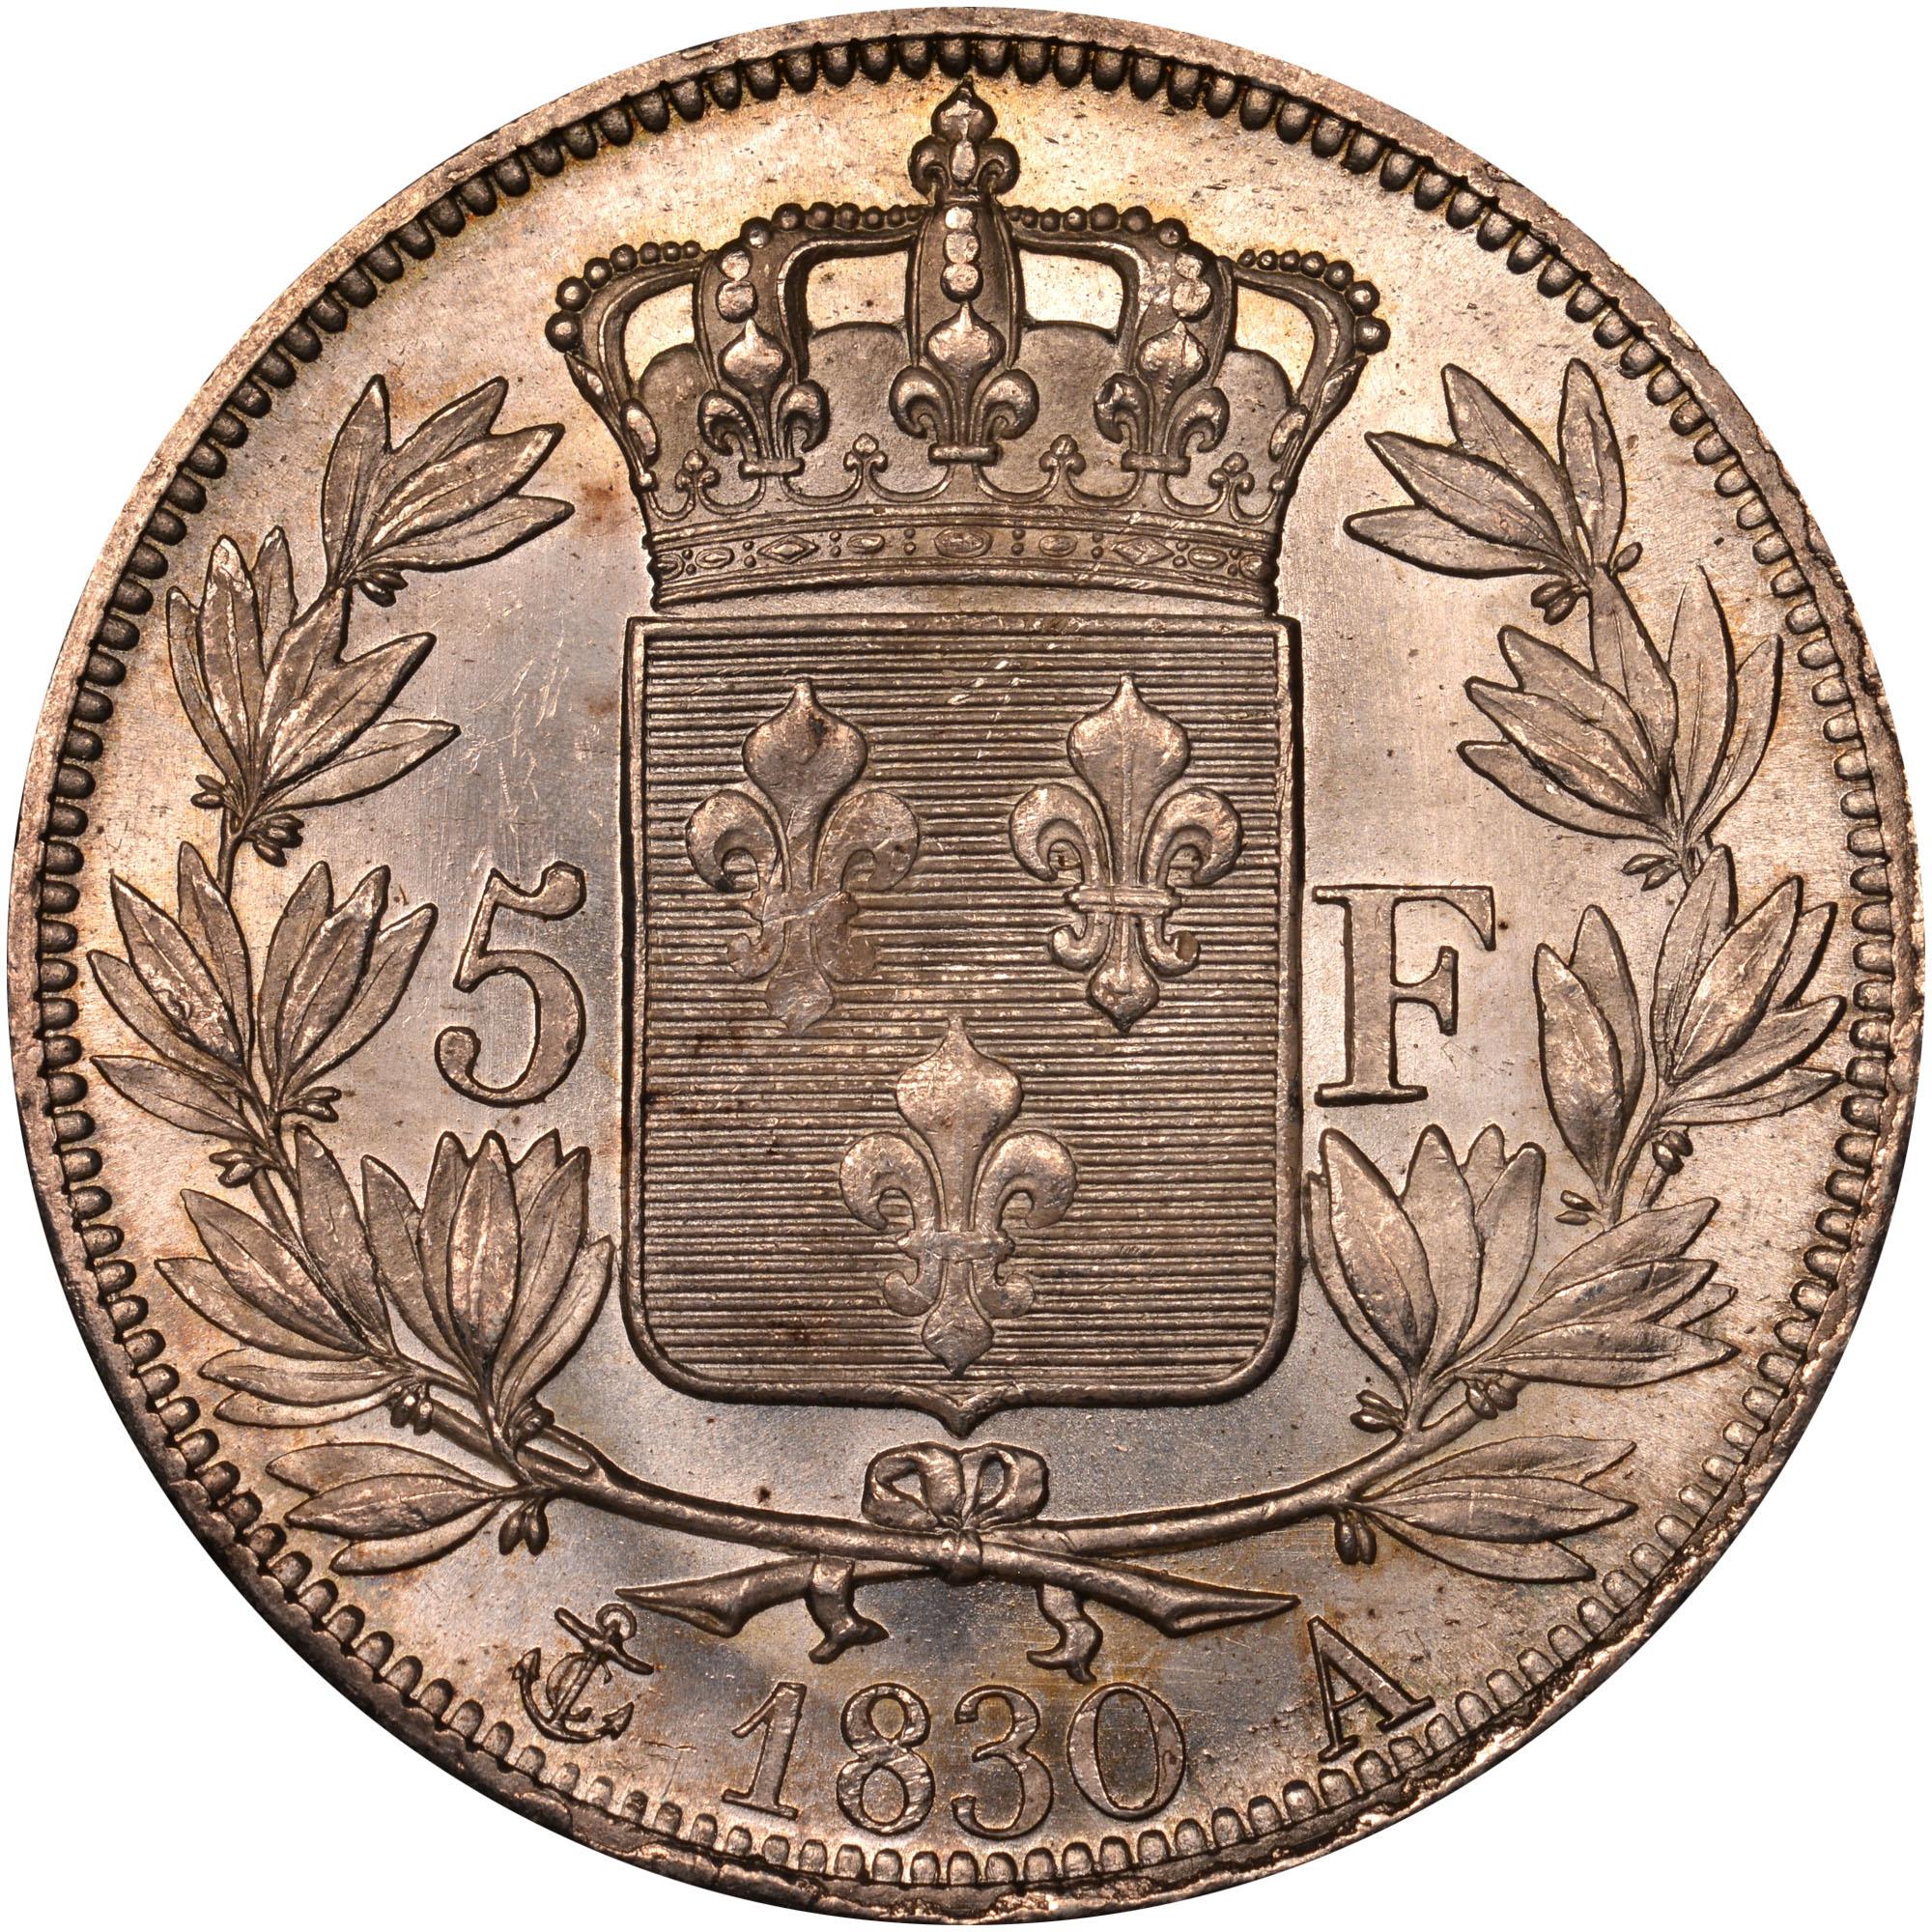 France 5 Francs reverse